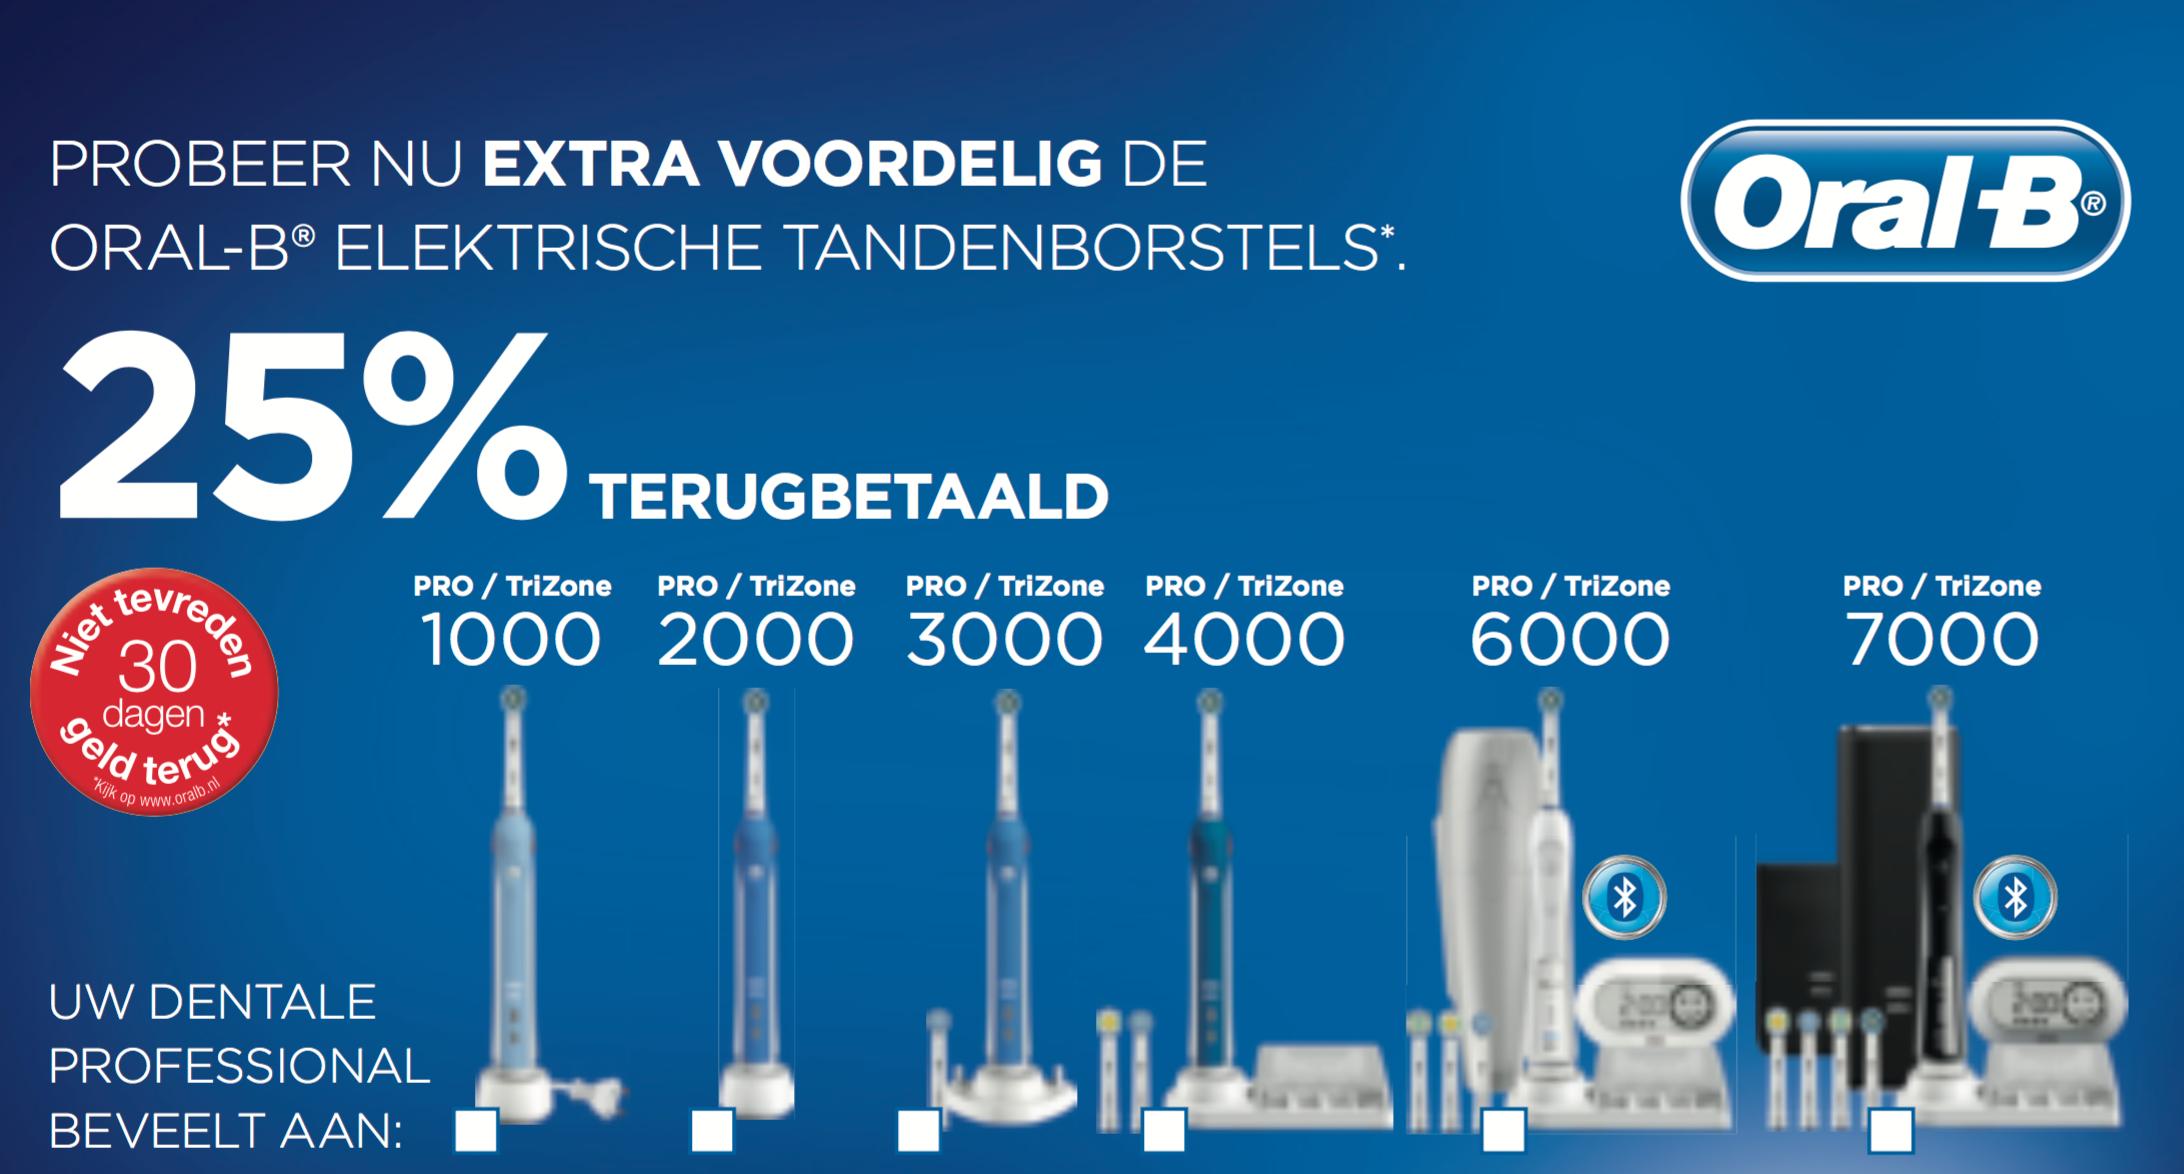 25% Korting Oral-B  : op TriZone / PRO 1000 2000 3000 4000 6000 7000